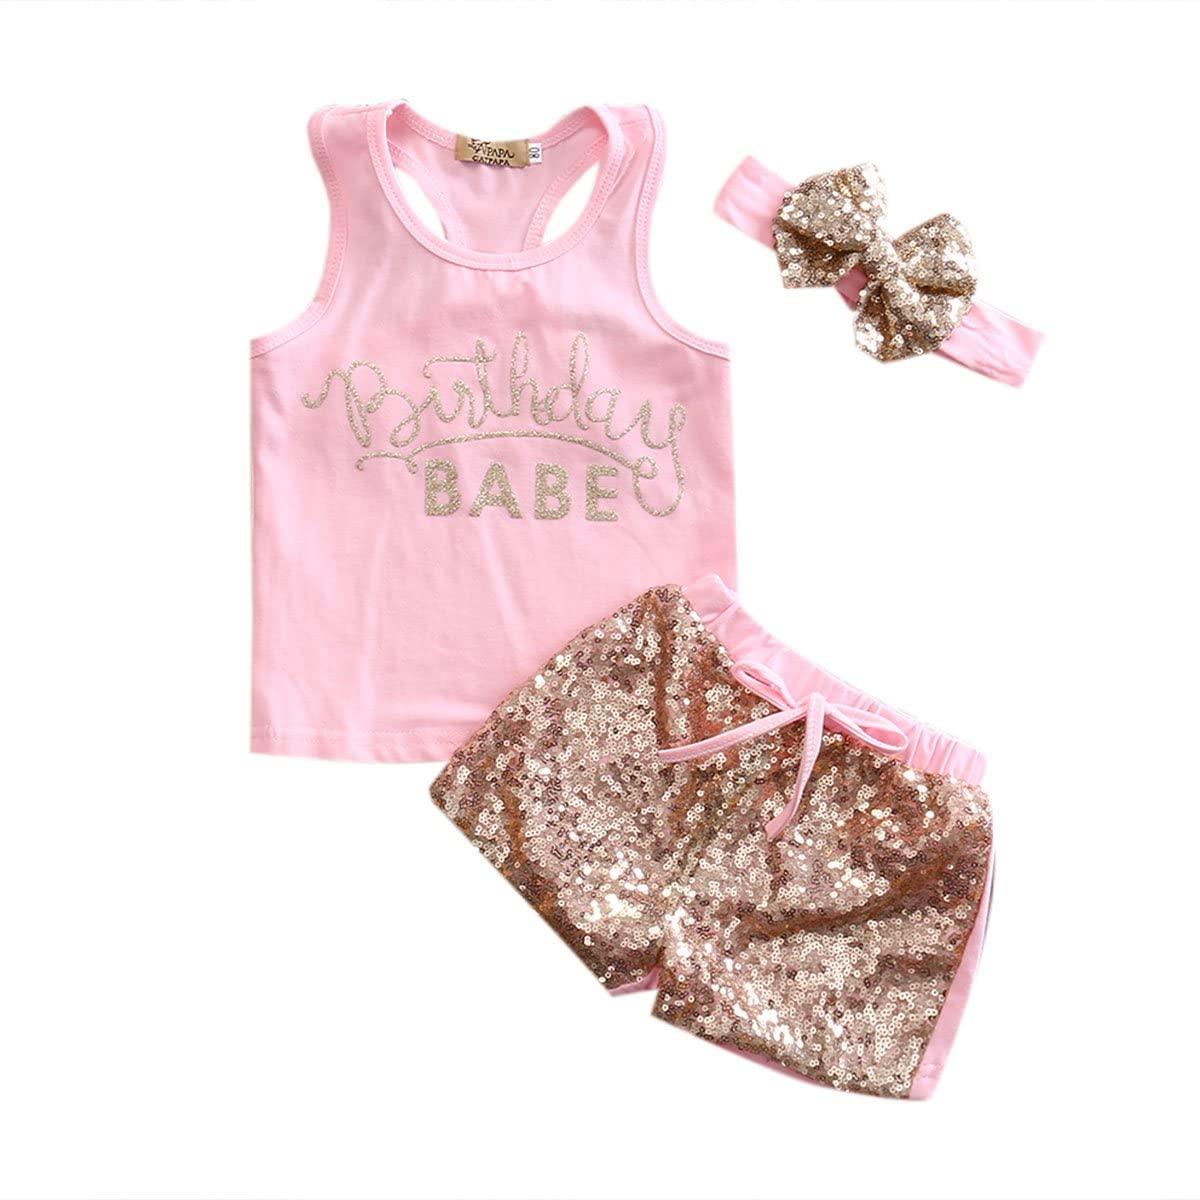 Multitrust Newborn Baby Girls Sequins Birthday Vest Tops and Shorts Set 3PCS Baby Girls Sleeveless Shirts Pants